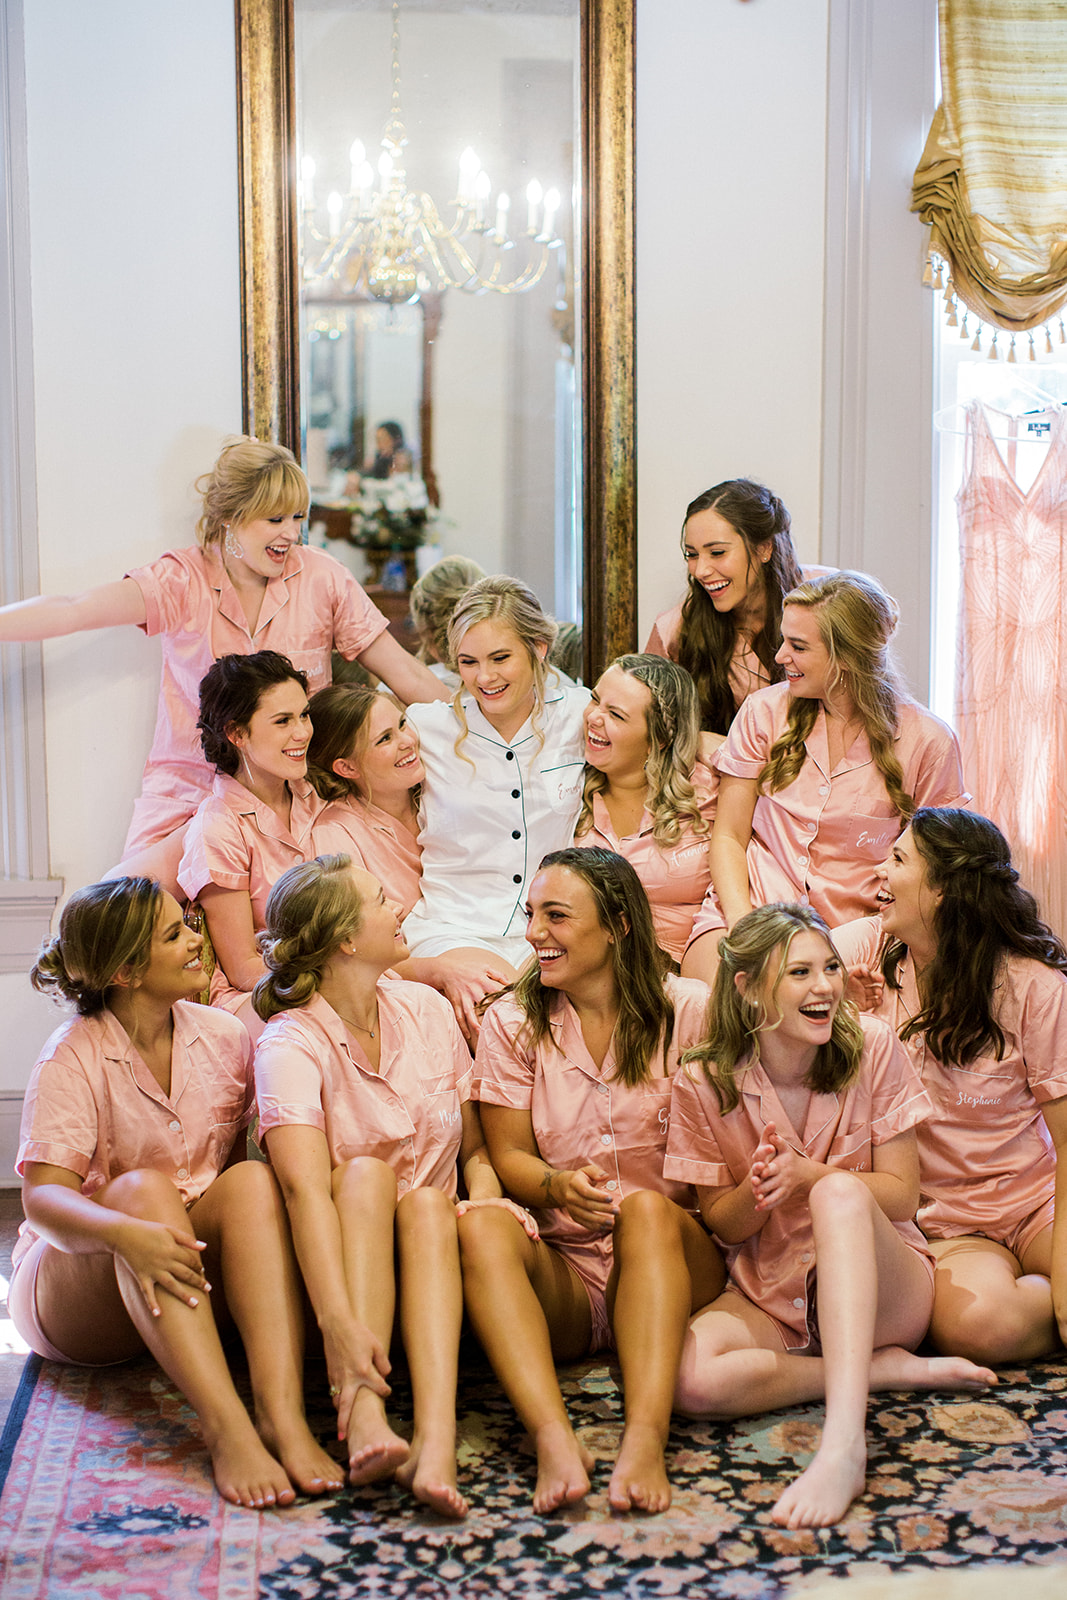 Tennessee Wedding Photographer Ashton Brooke Photography | Nashville Bride Guide